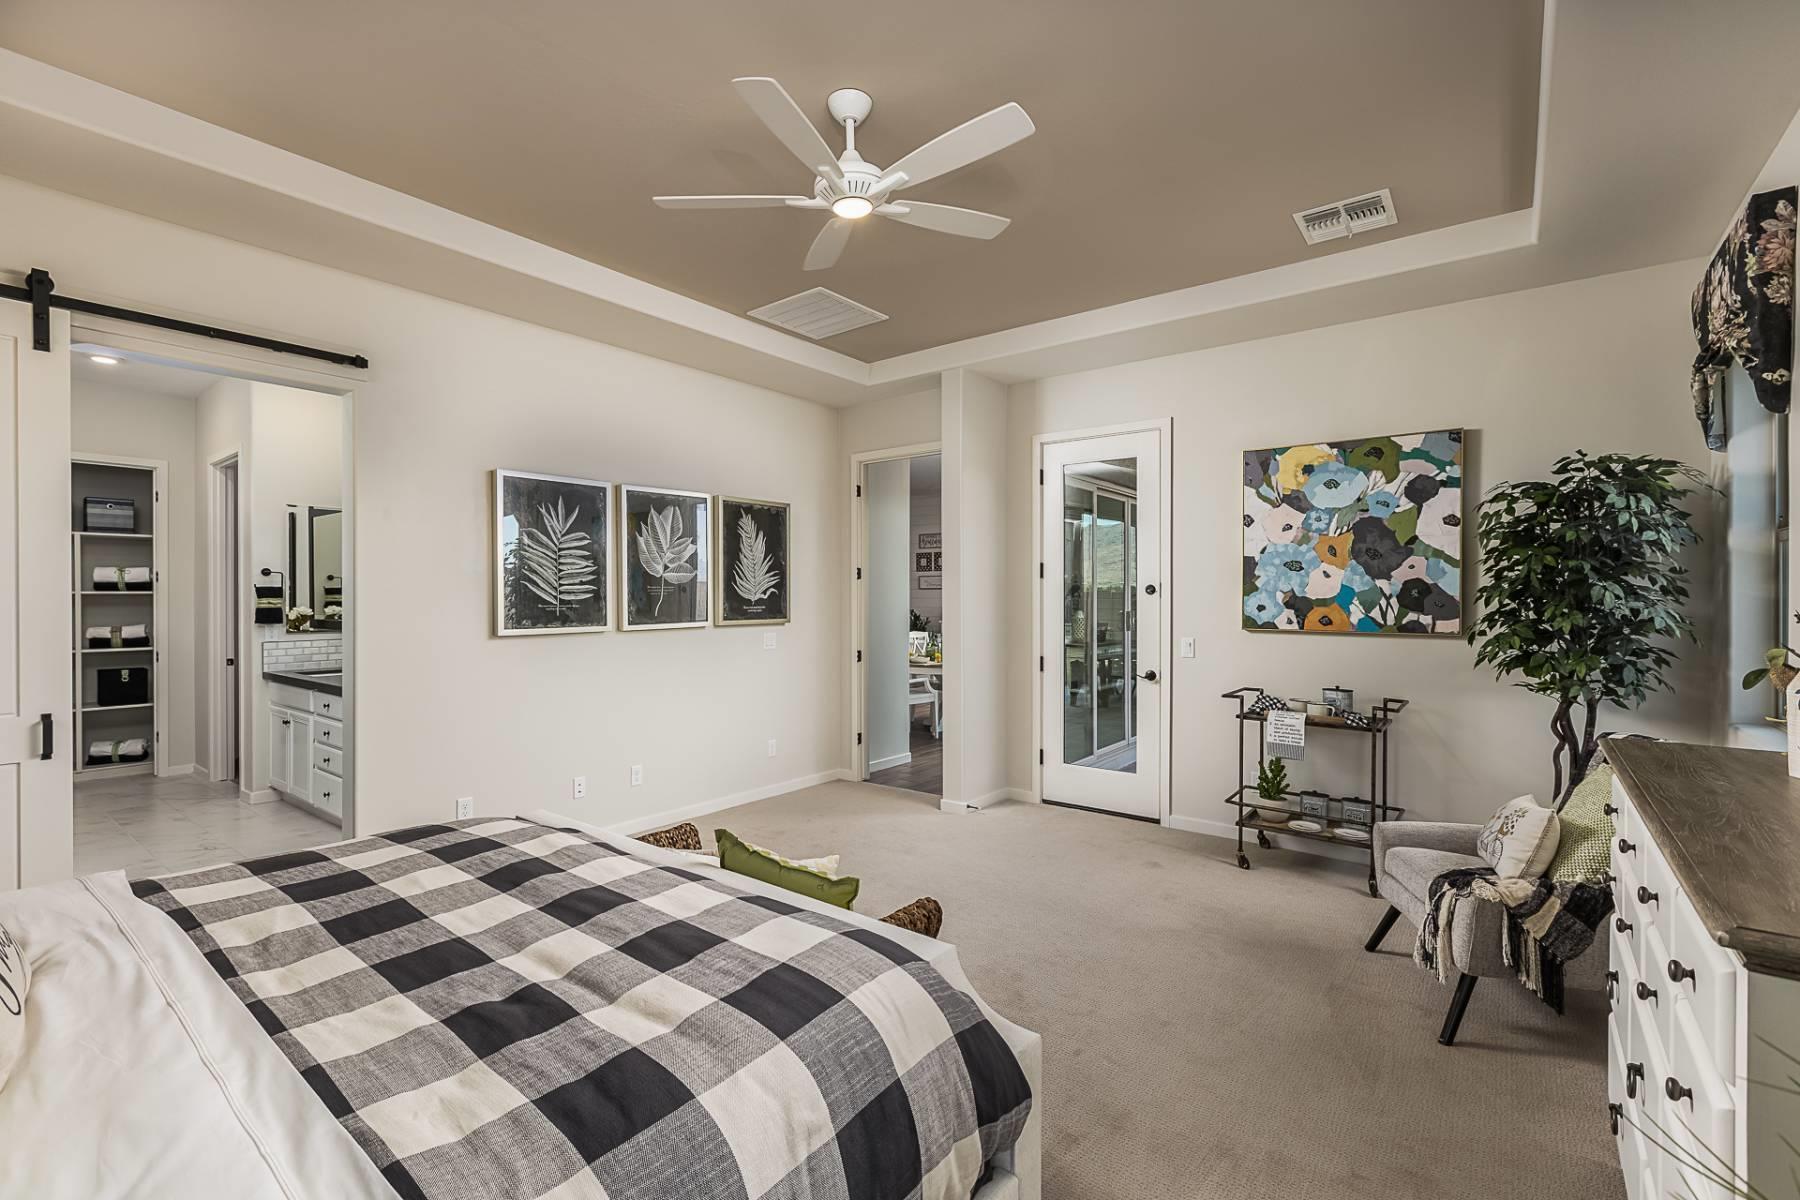 Bedroom featured in the Plan 2929 By Elliott Homes - Arizona in Yuma, AZ